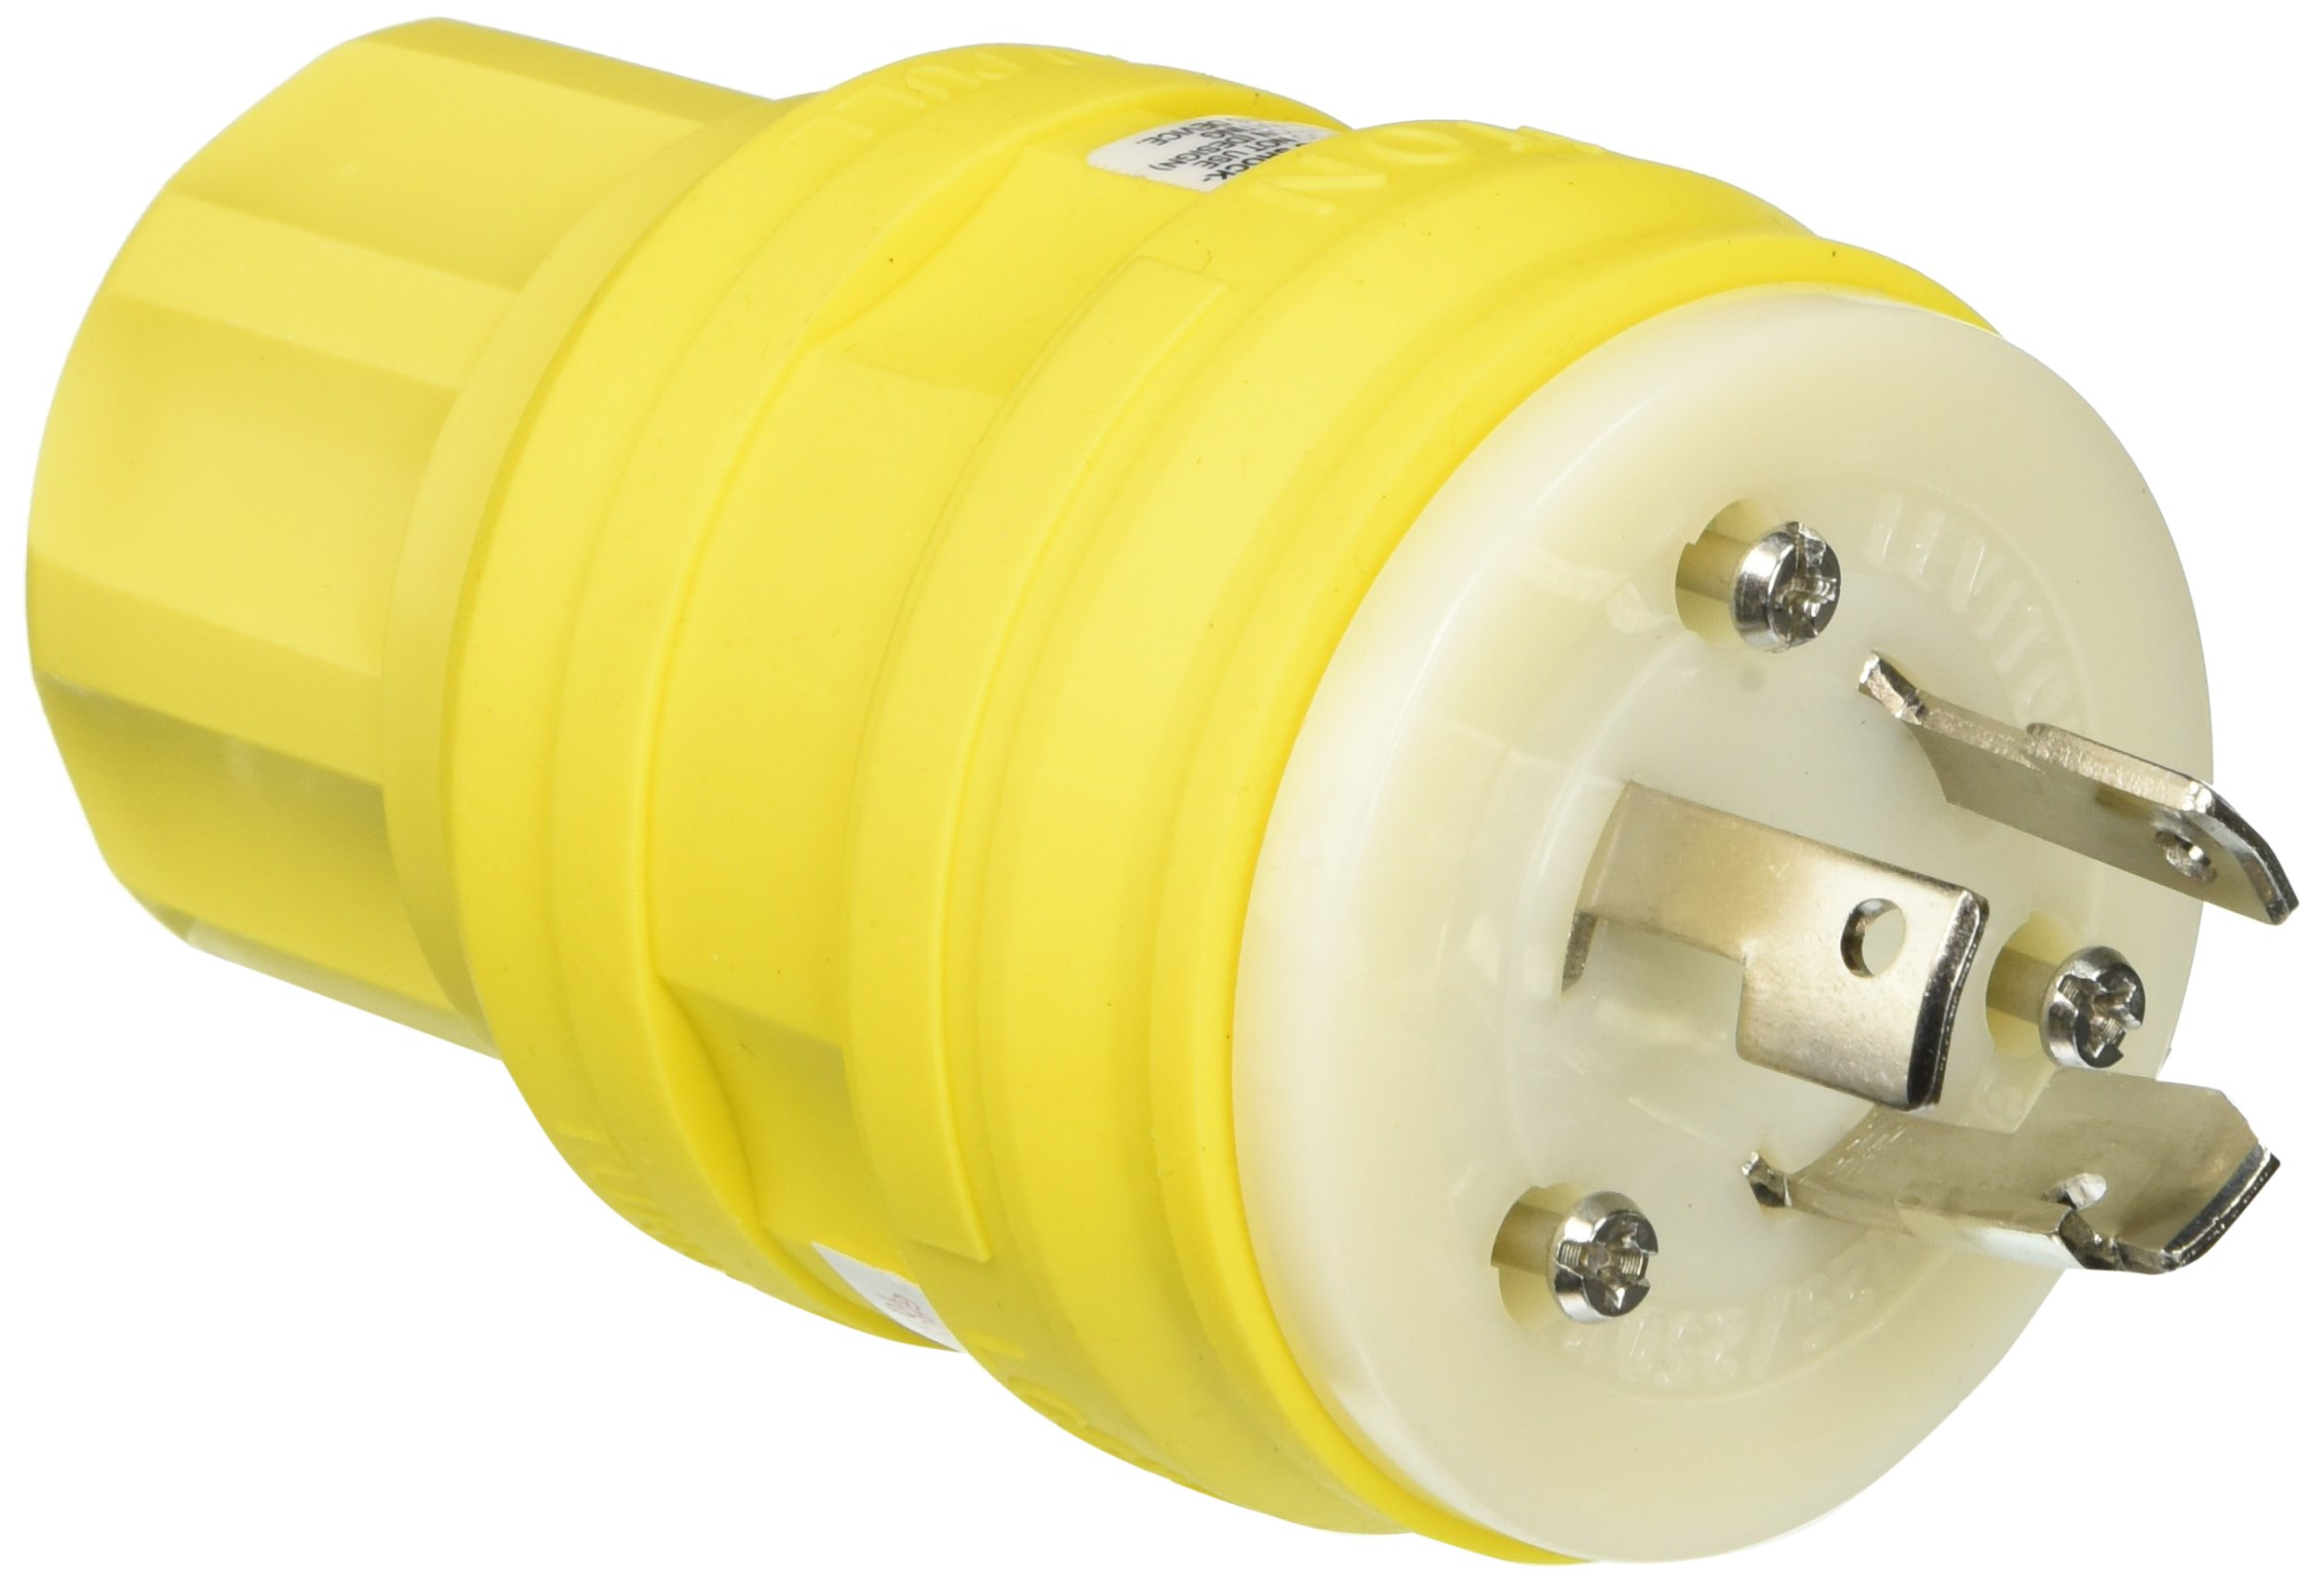 Leviton 28W08 30-Amp, 125/250-Volt, Non-NEMA, 3P, 3W, Locking Plug, Industrial Grade, Non-Grounding, Wetguard, Yellow